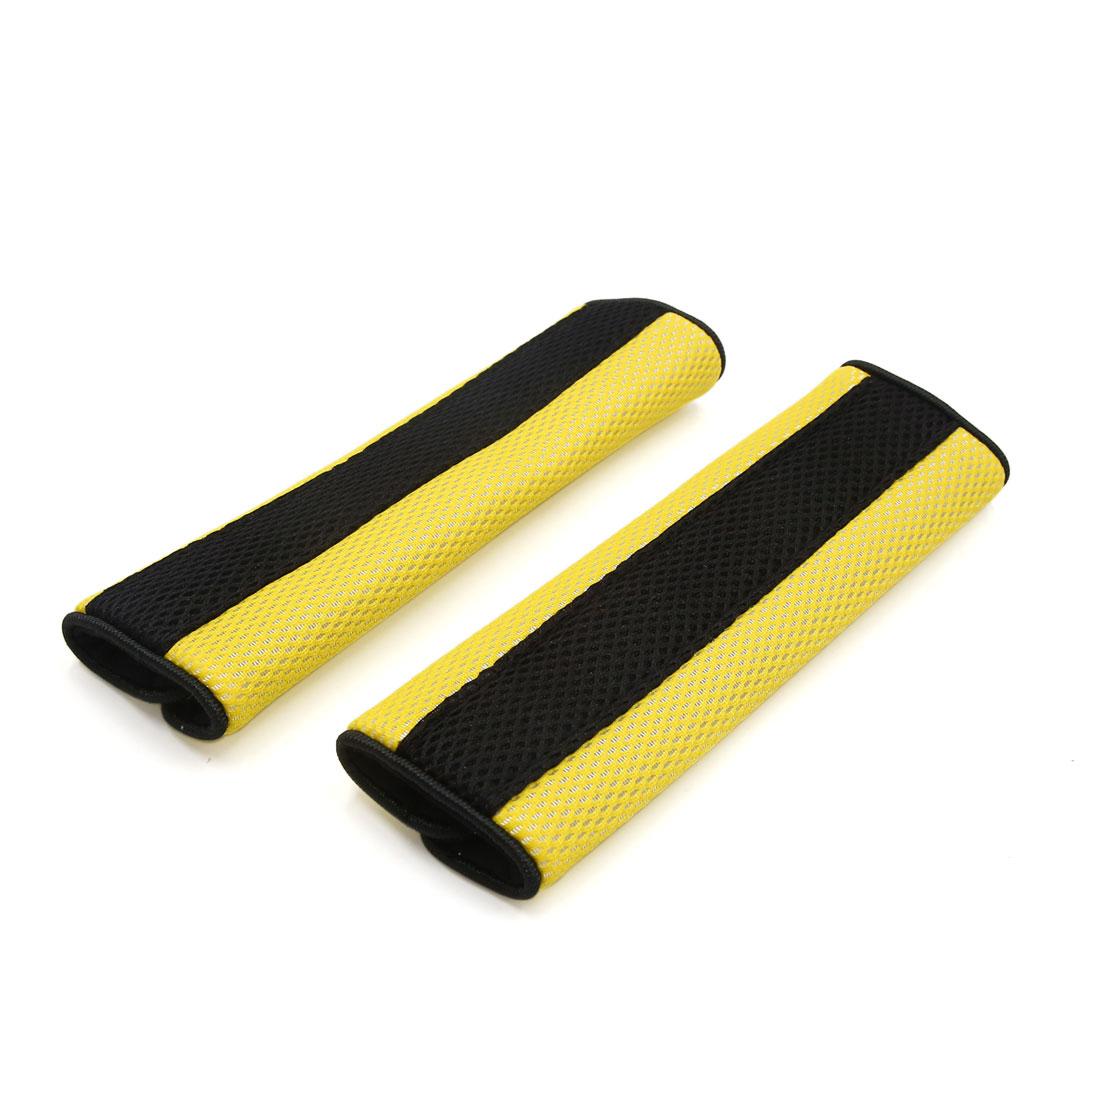 21cm Long Hook Loop Fastener Car Safety Seat Belt Cover Shoulder Cushion Pad Yellow Black Pair